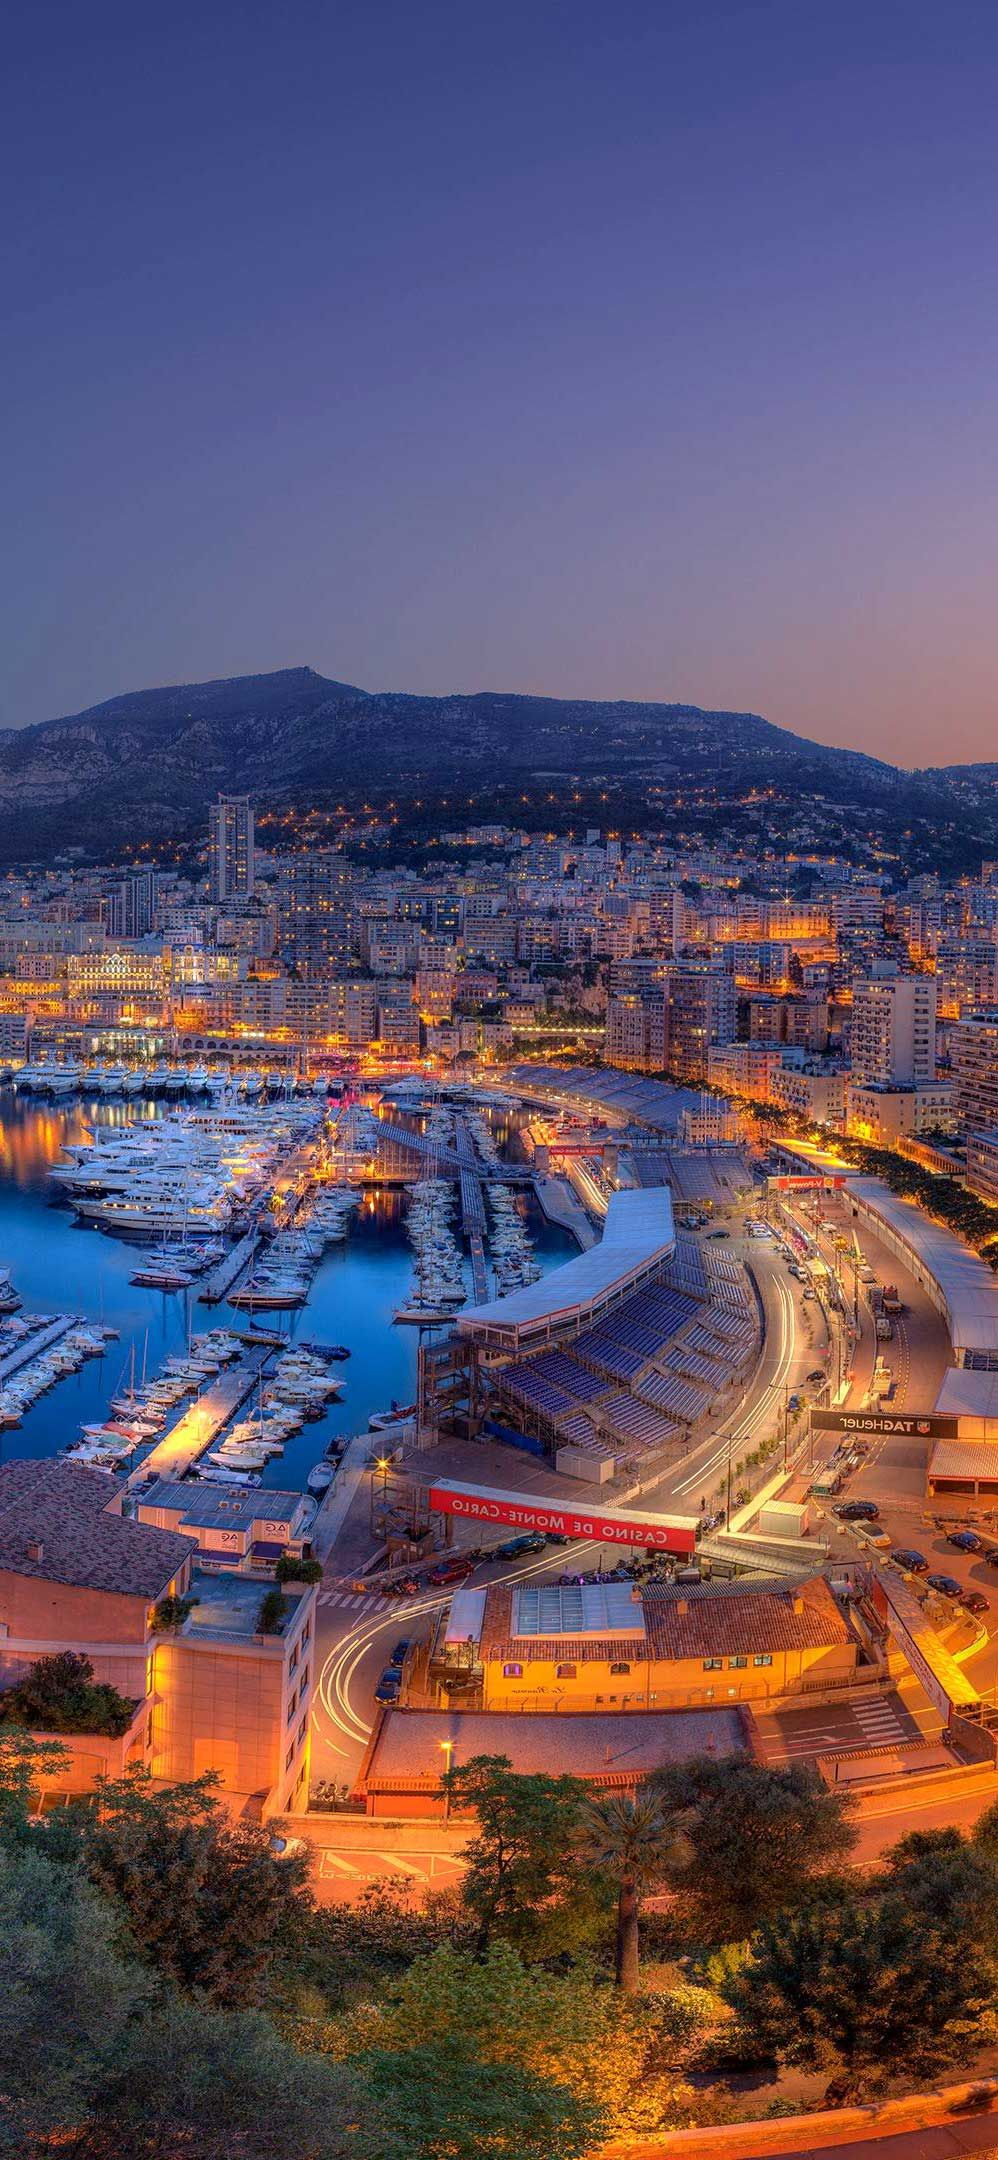 Iphone Wallpaper Monaco Monte Carlo Sky Hd Iphone Wallpaper Travel Nightlife Travel Sky Hd